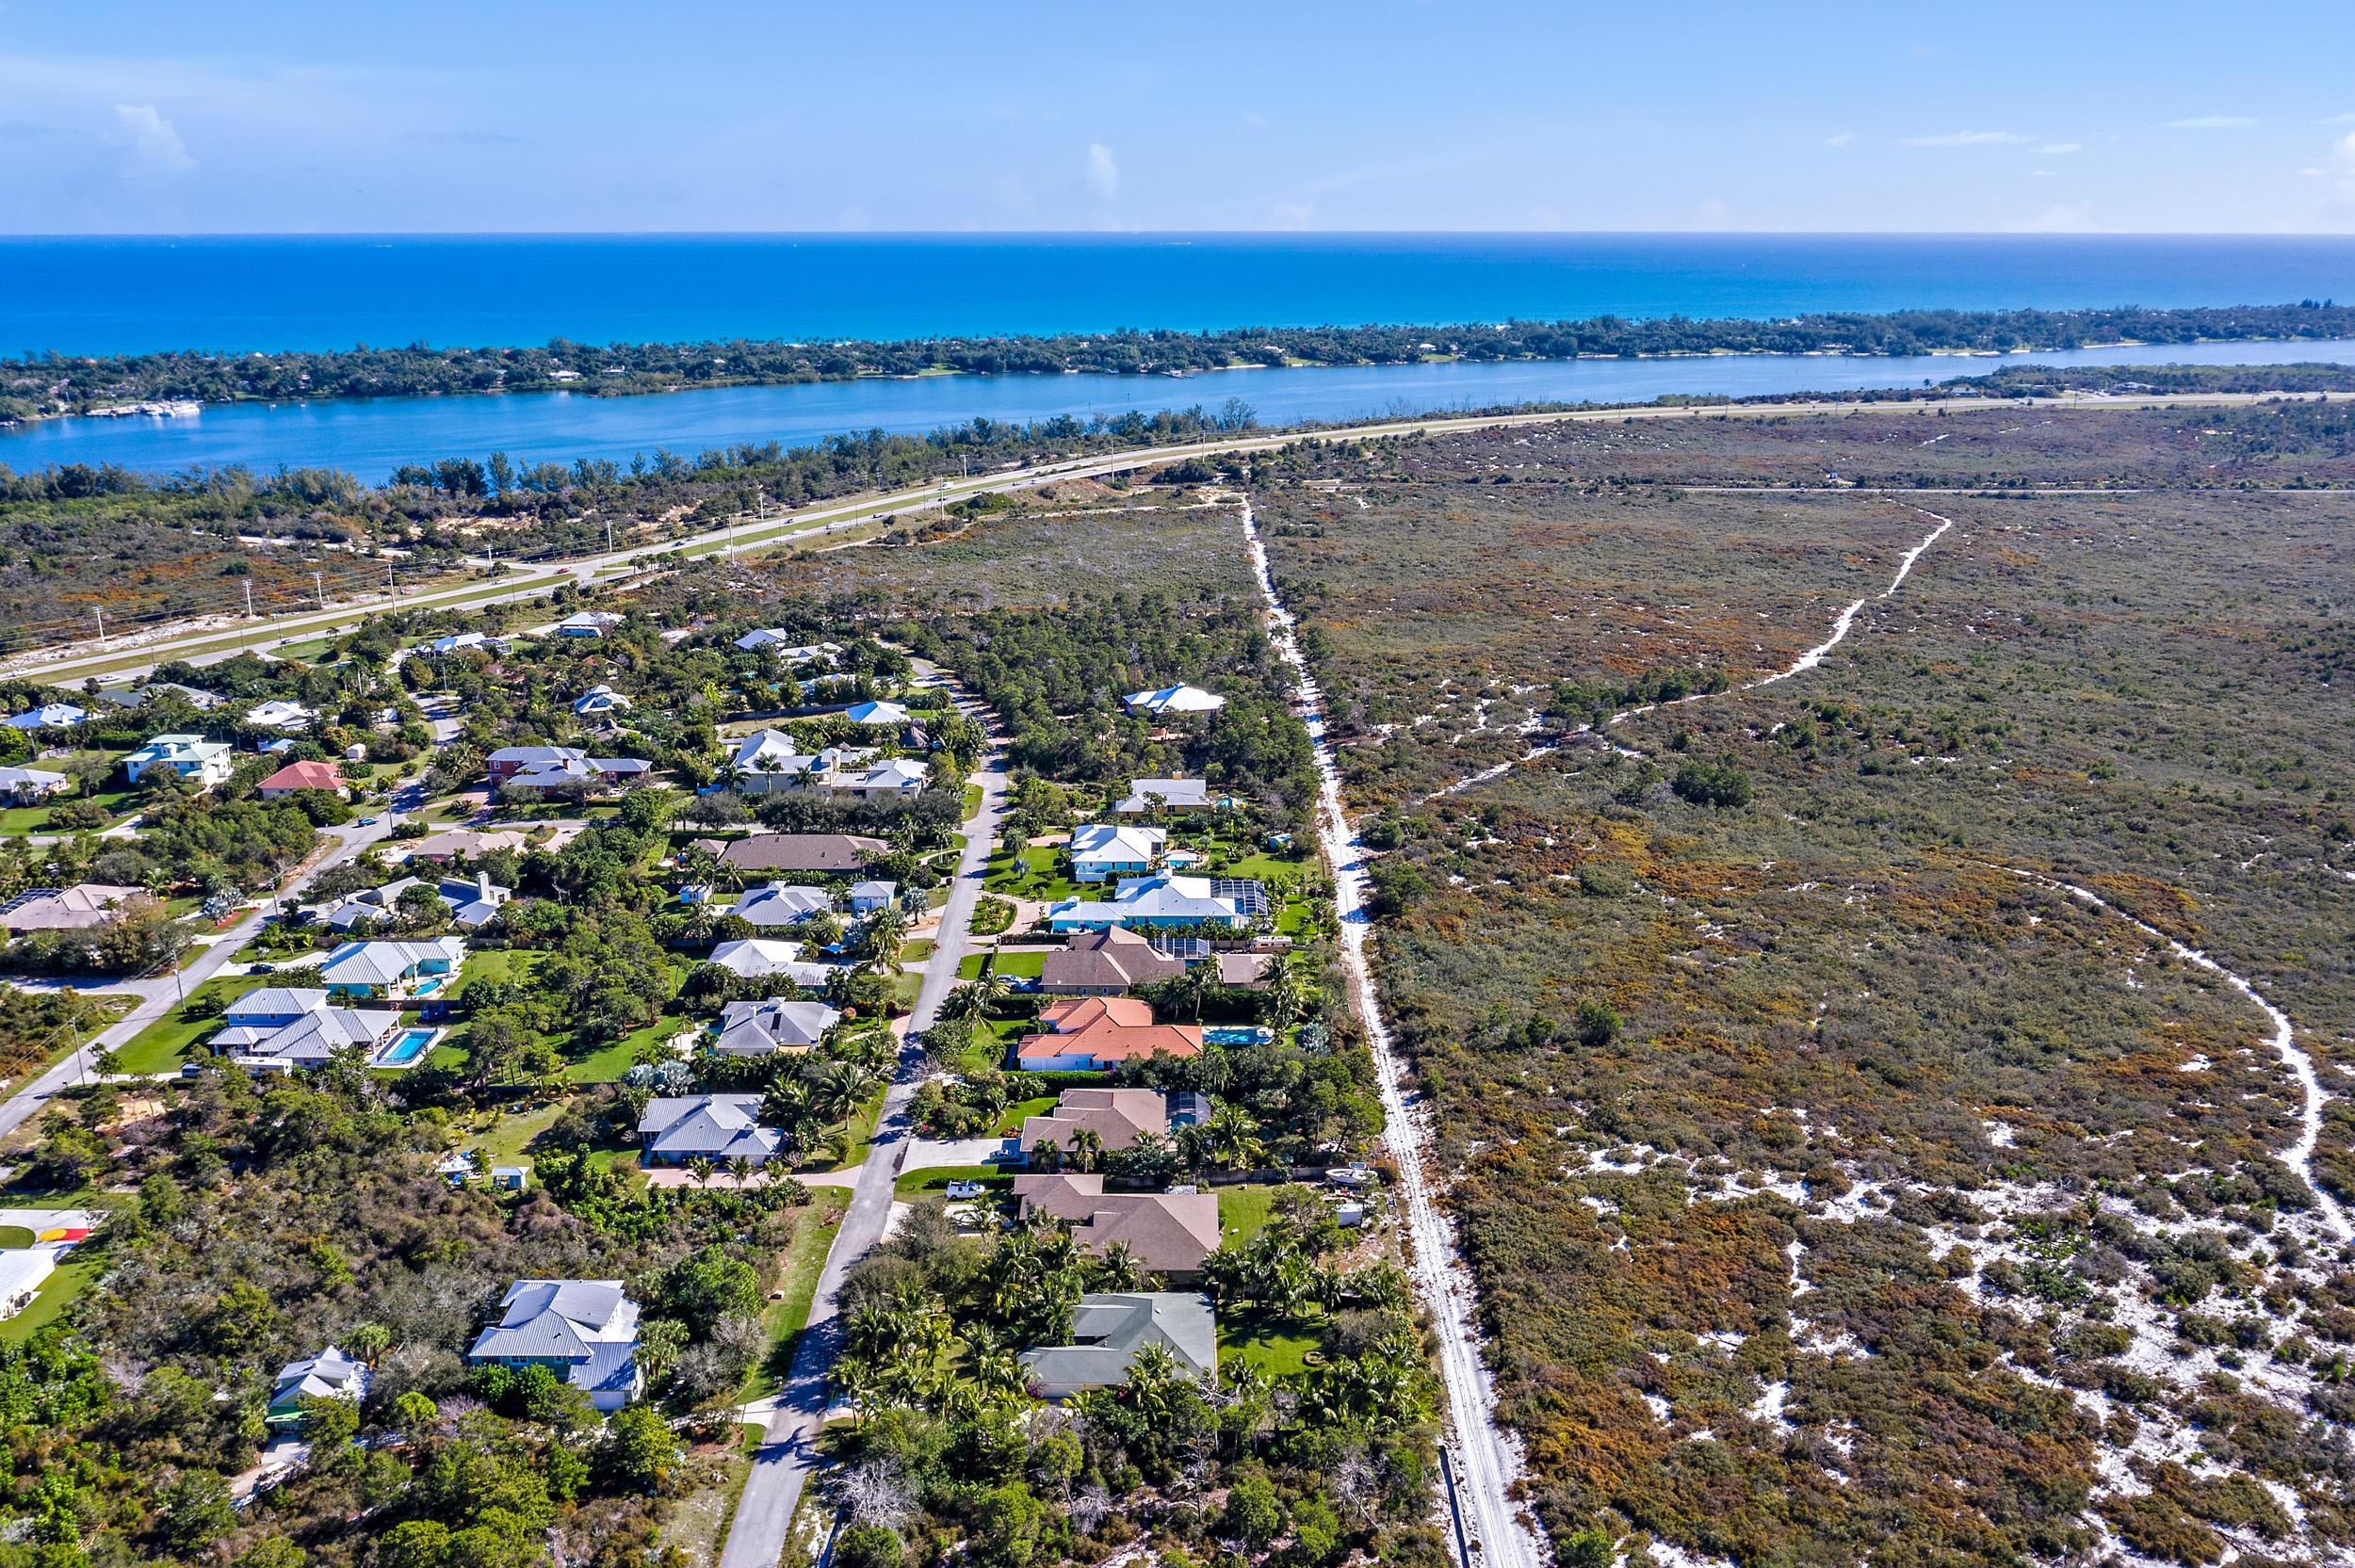 9588 Sharon Street, Hobe Sound, Florida 33455, 3 Bedrooms Bedrooms, ,2 BathroomsBathrooms,A,Single family,Sharon,RX-10594665